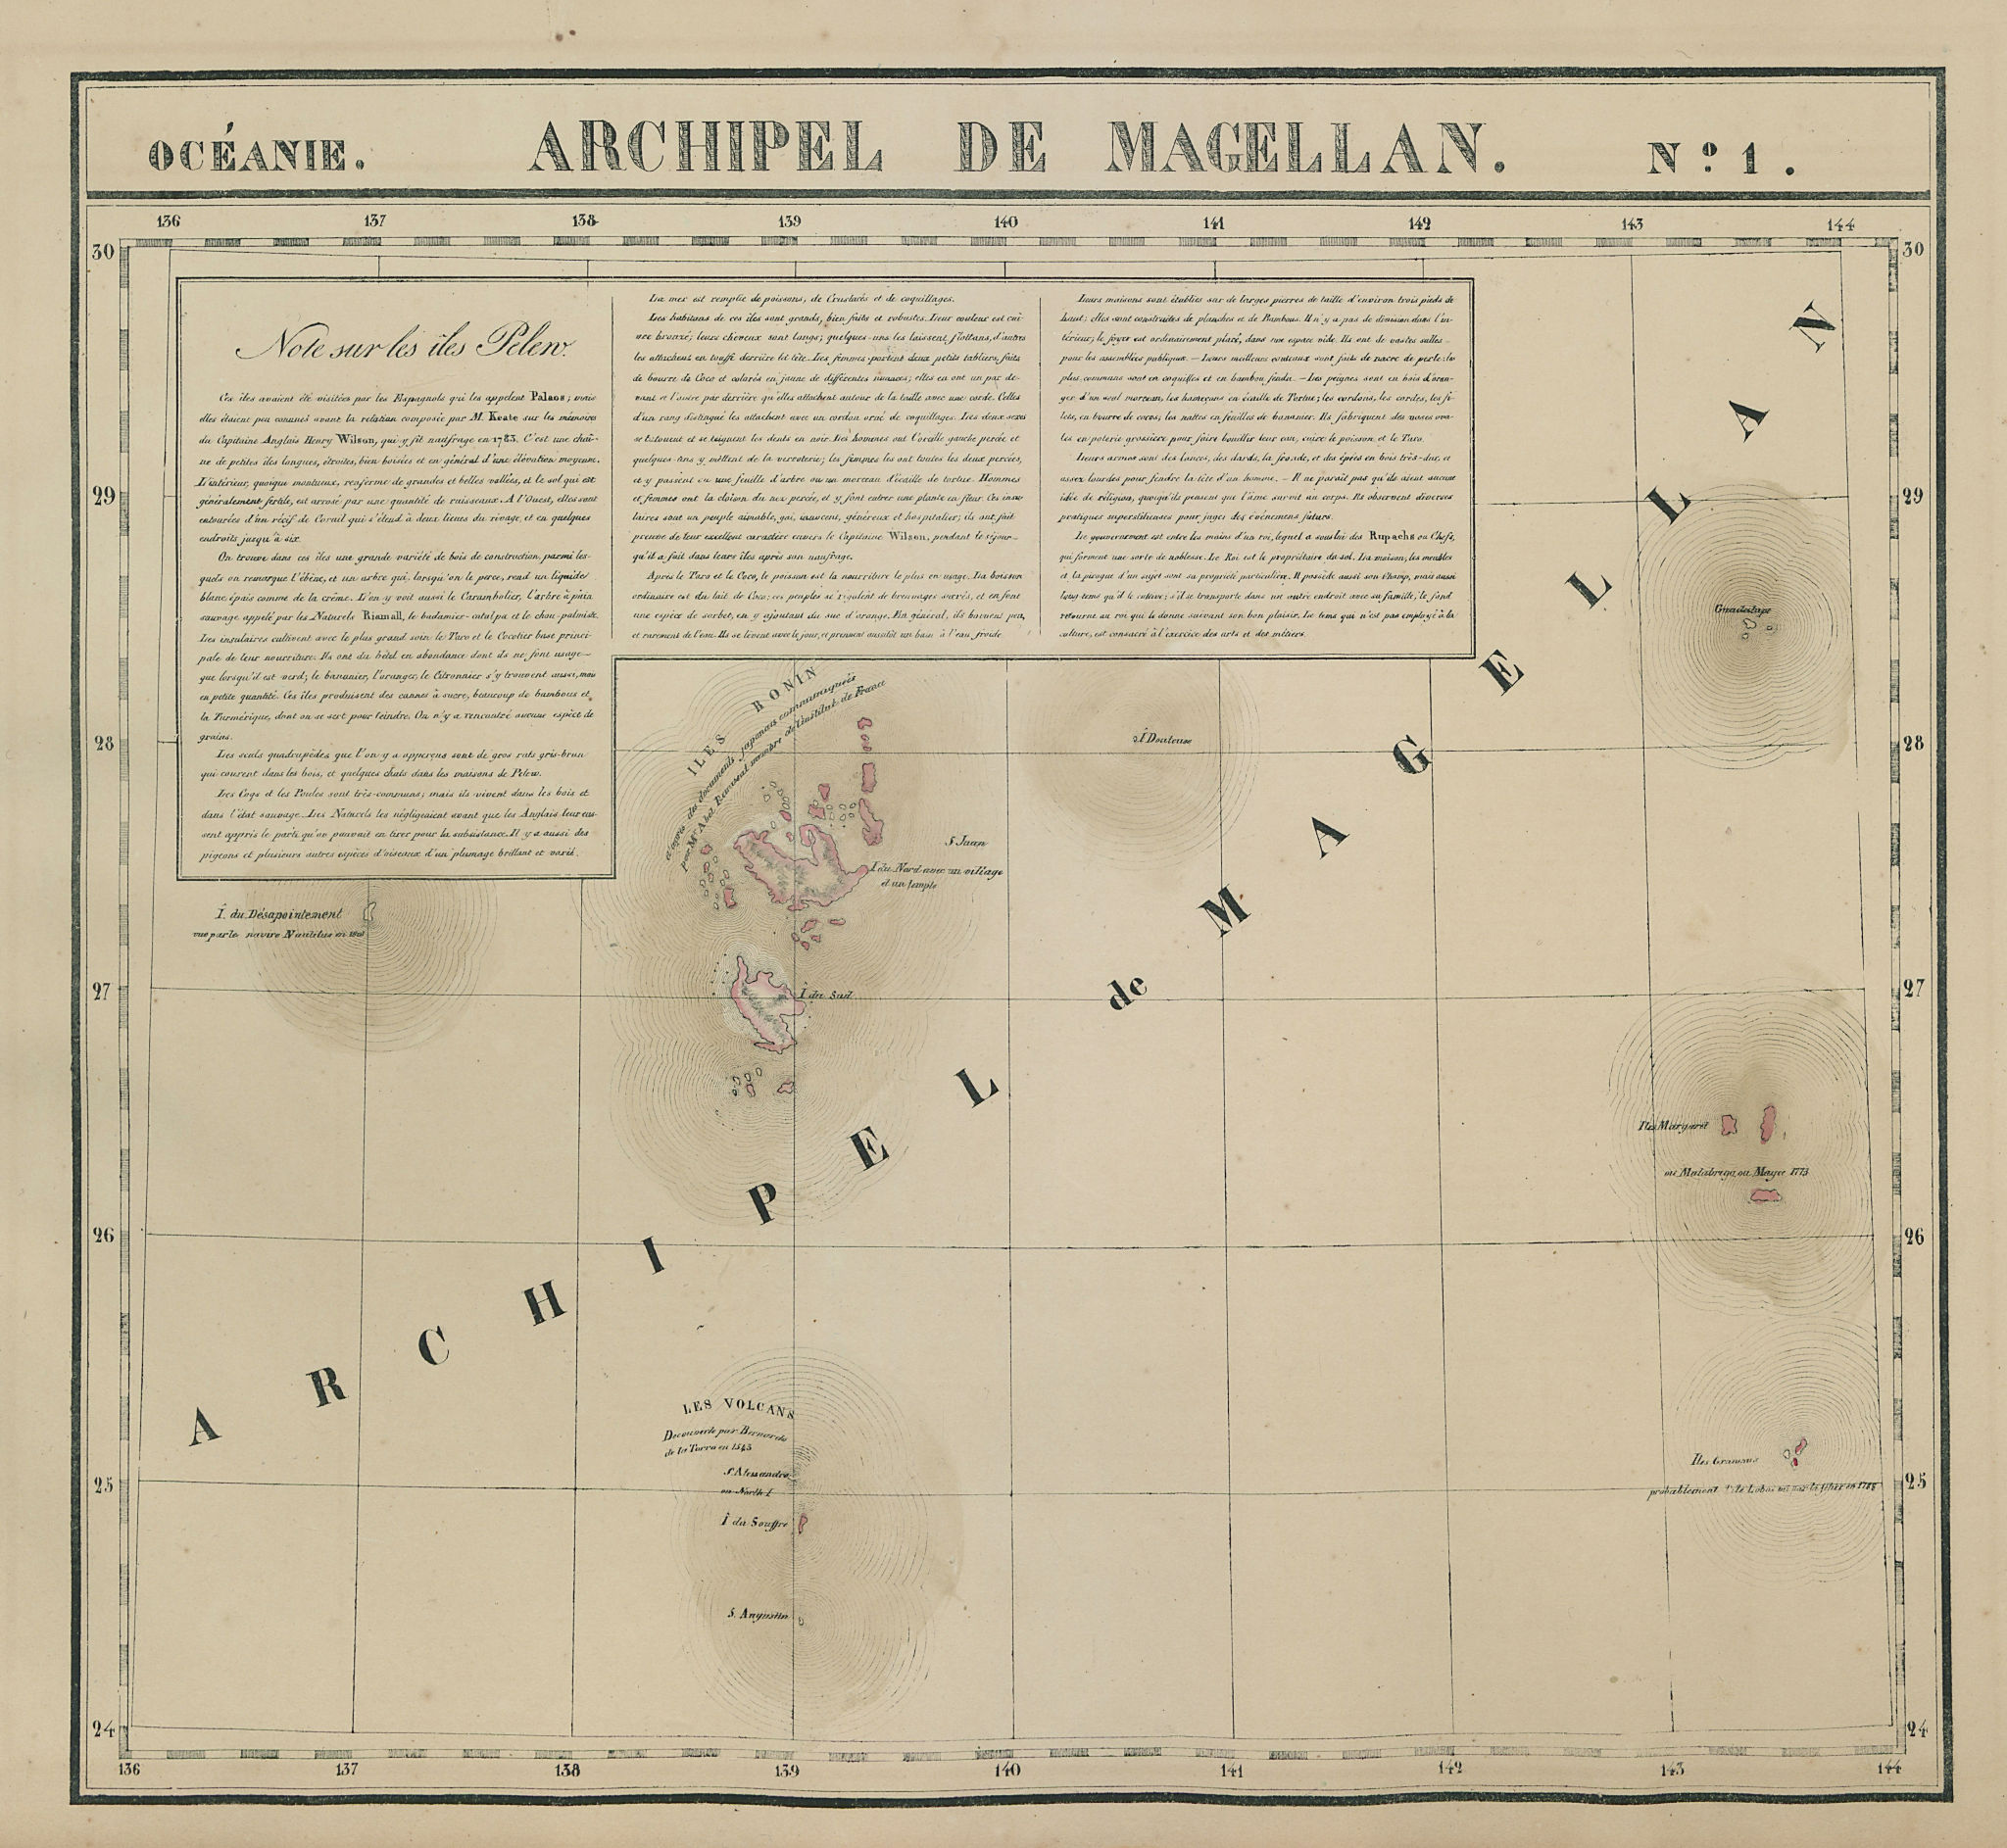 Océanie. Archipel de Magellan #1. Bonin Ogasawara Islands. VANDERMAELEN 1827 map